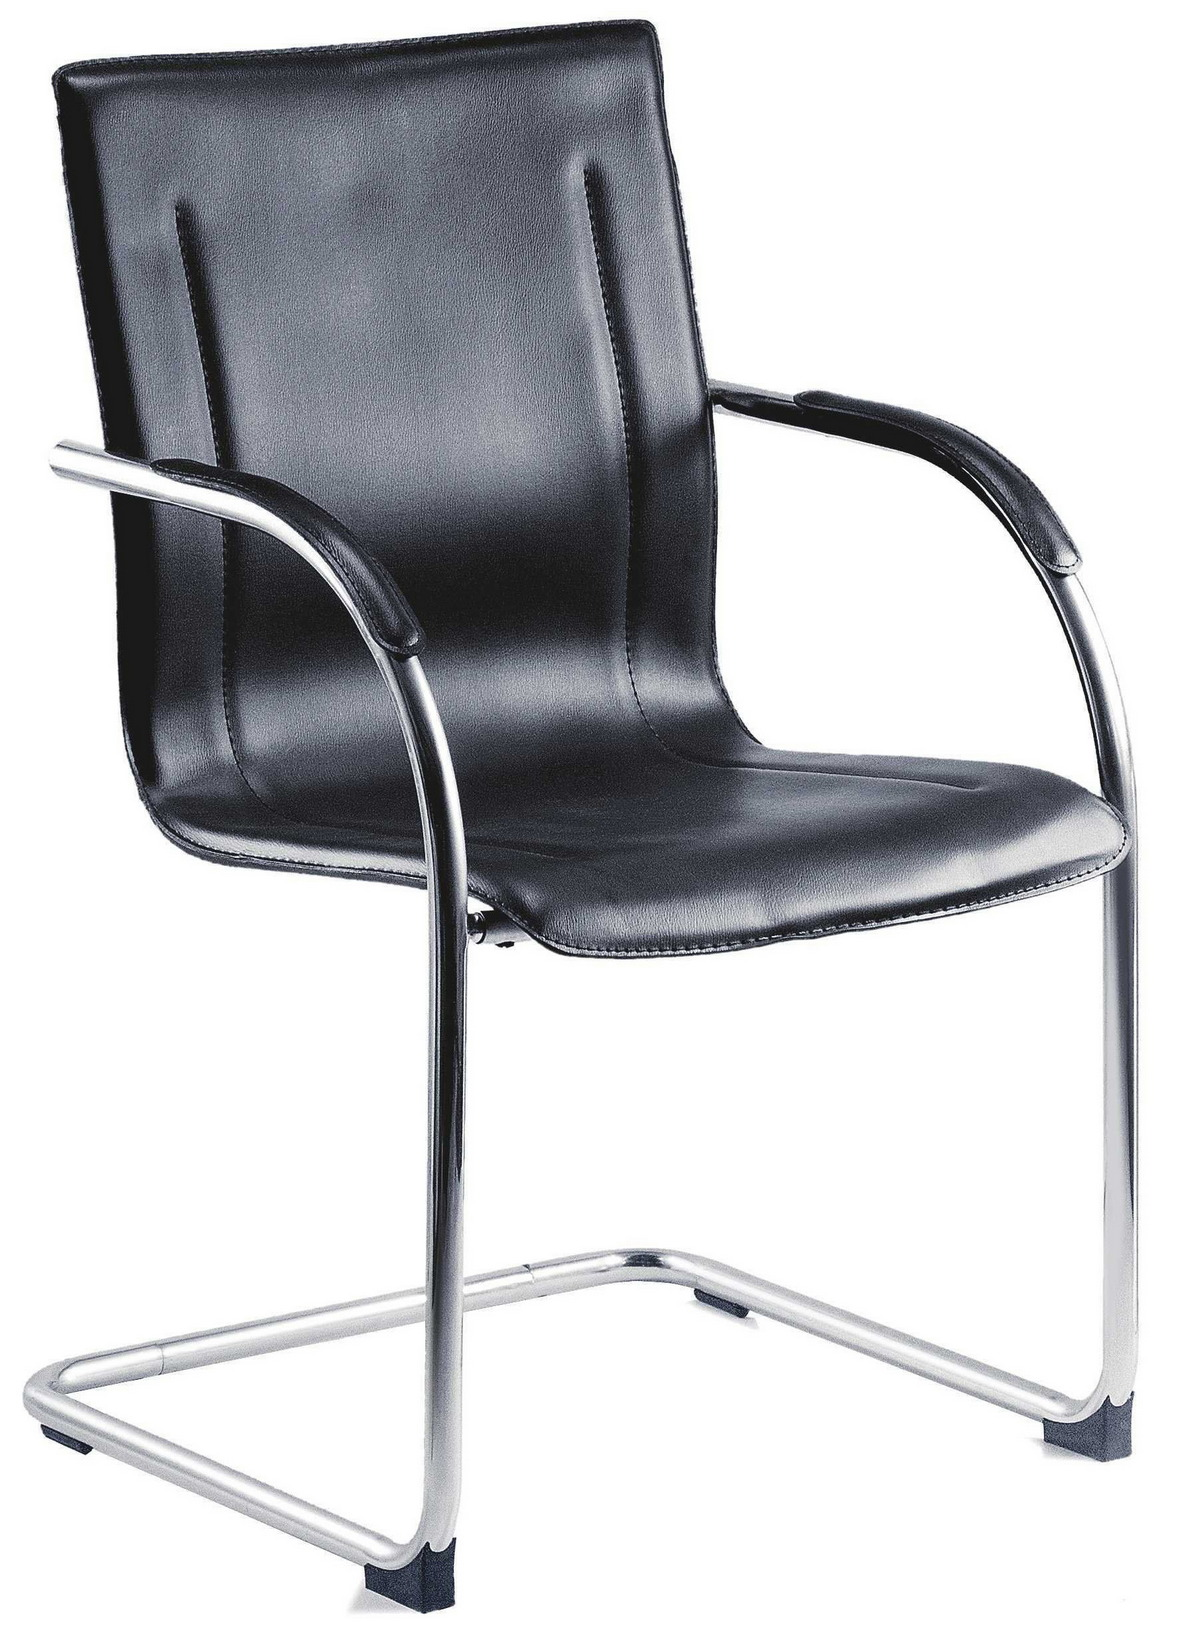 Salli saddle chair Lookup BeforeBuying